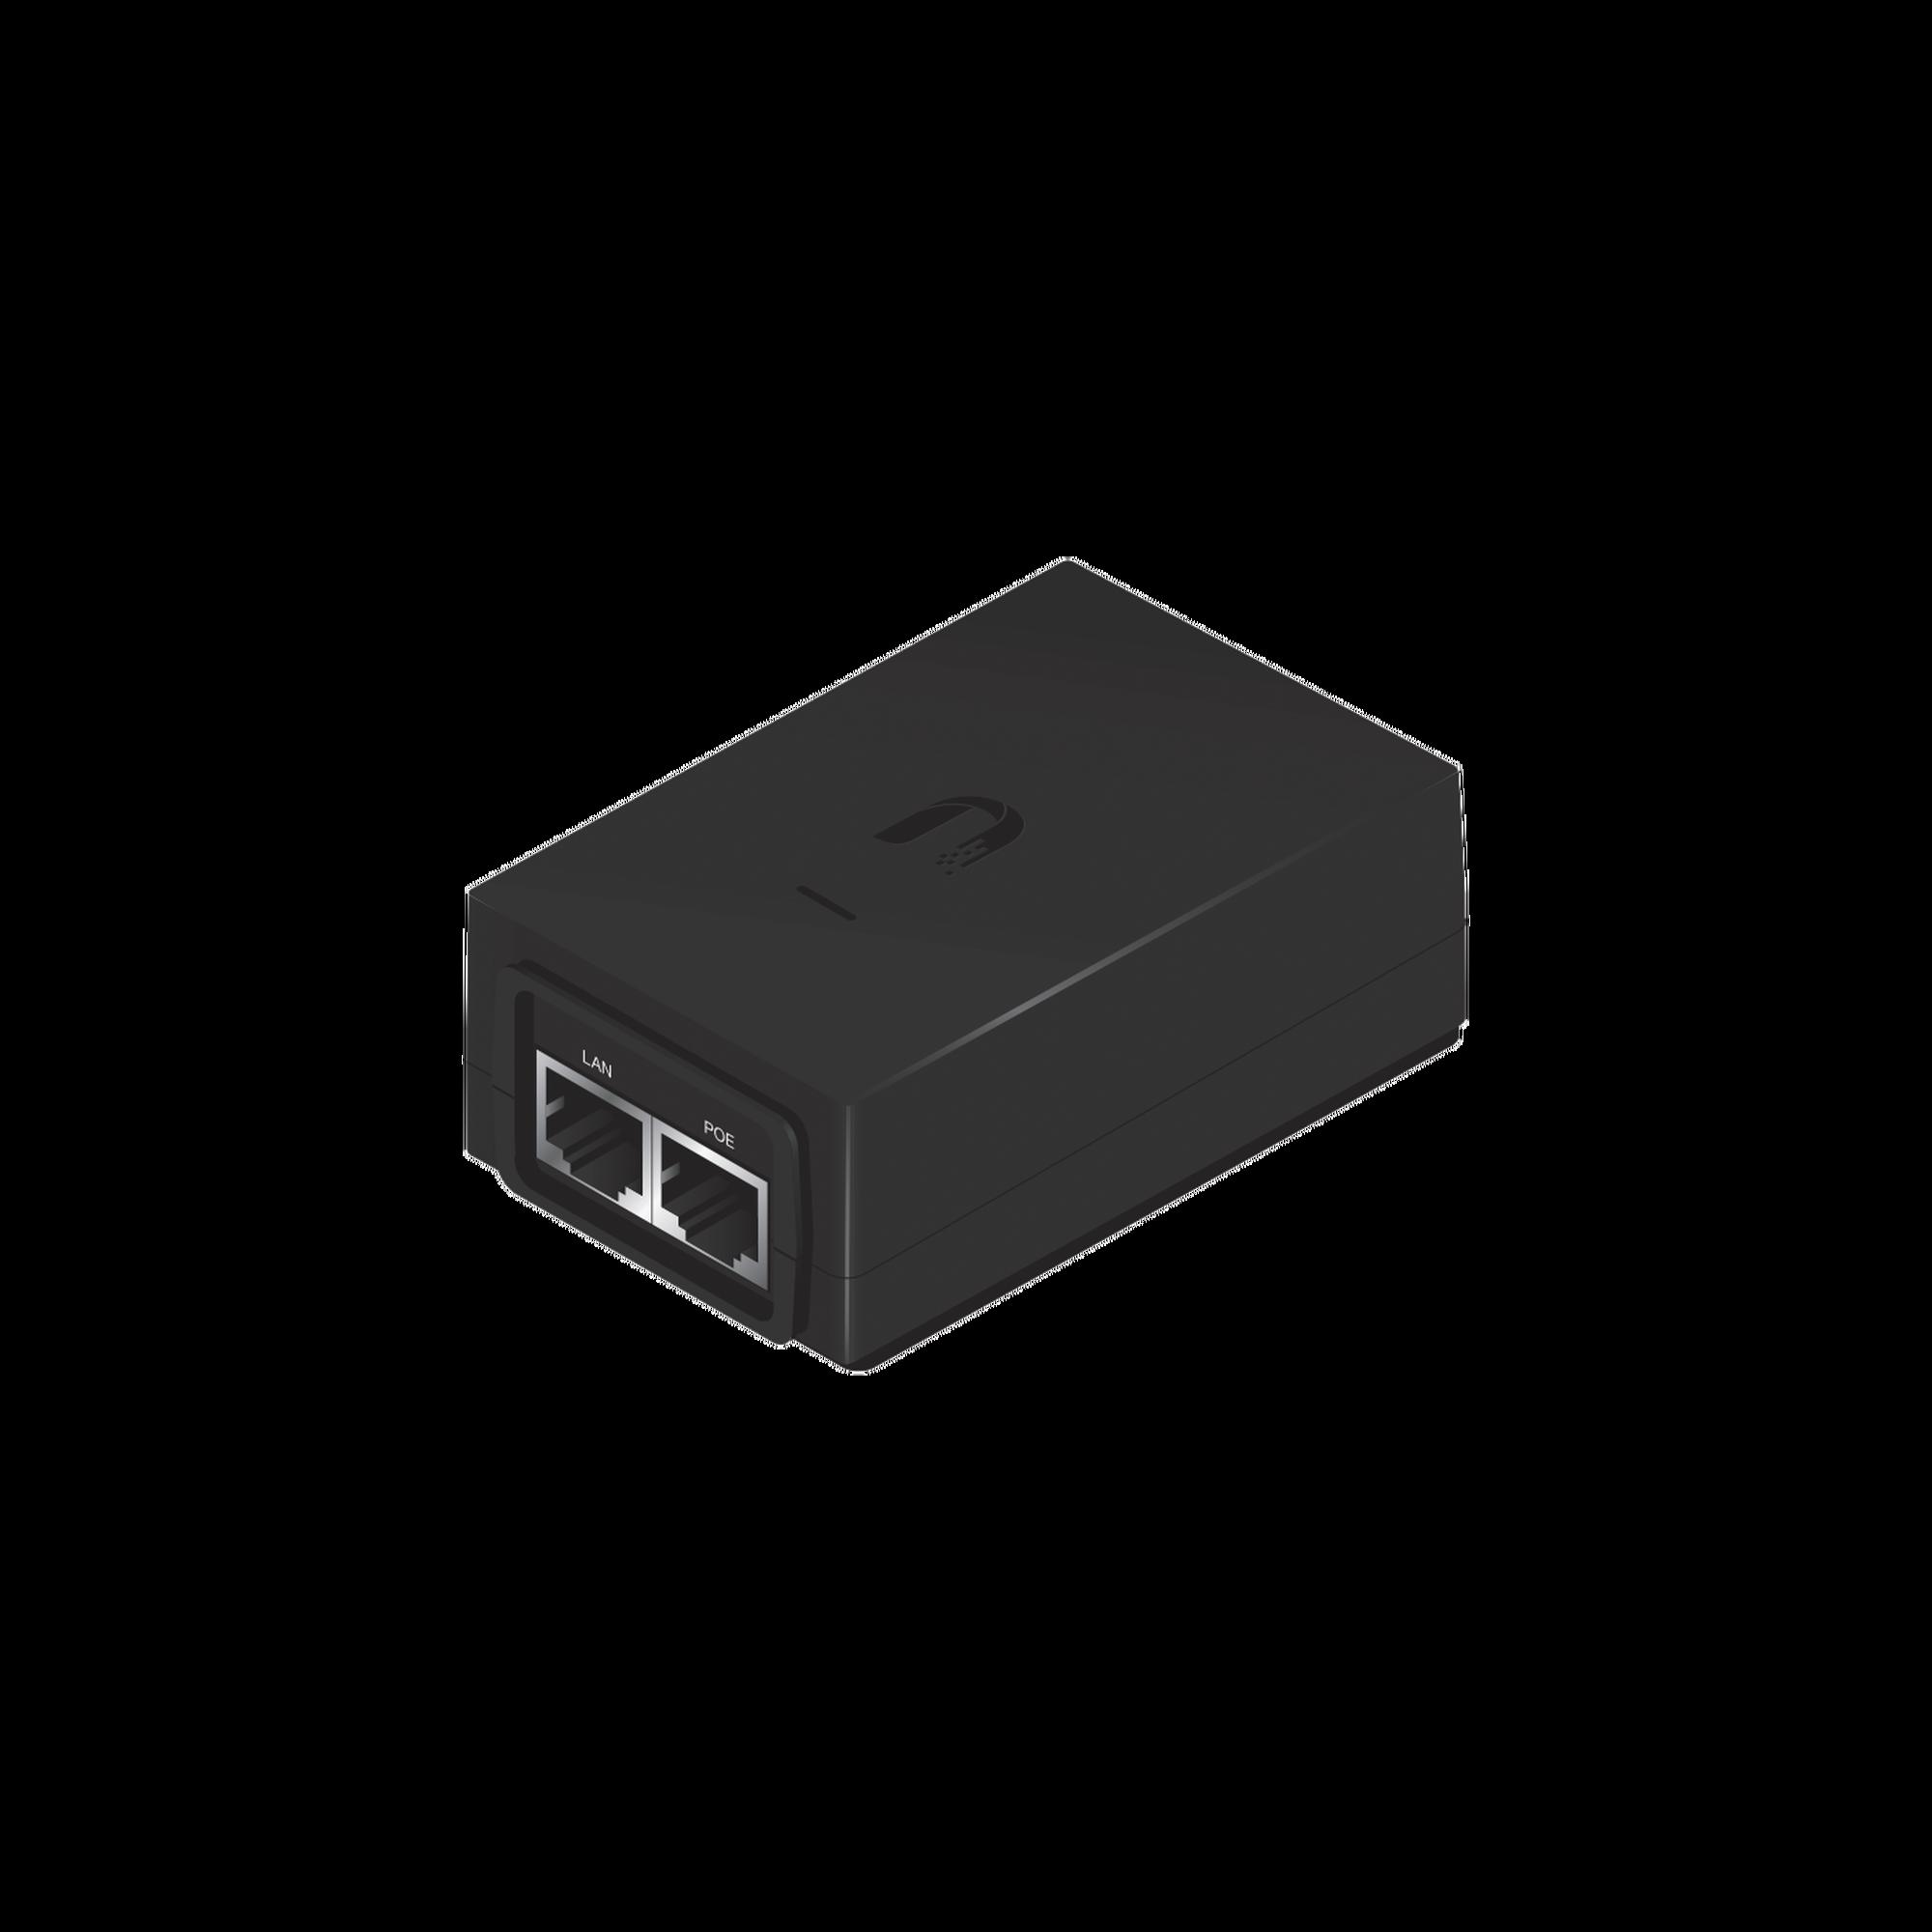 Adaptador PoE Ubiquiti de 24 VDC, 1.0 A con puerto Gigabit